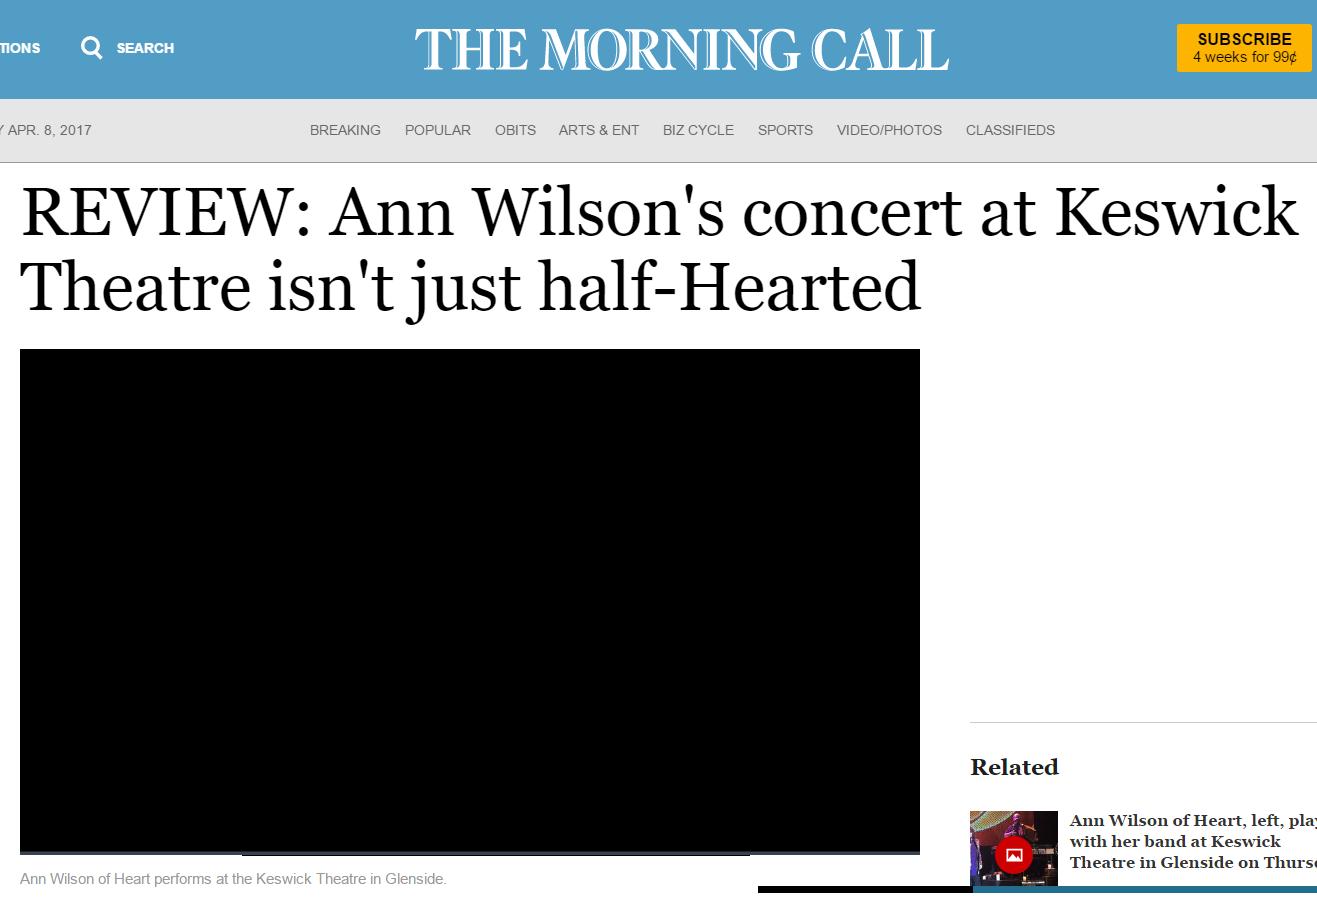 ann wilson of heart review